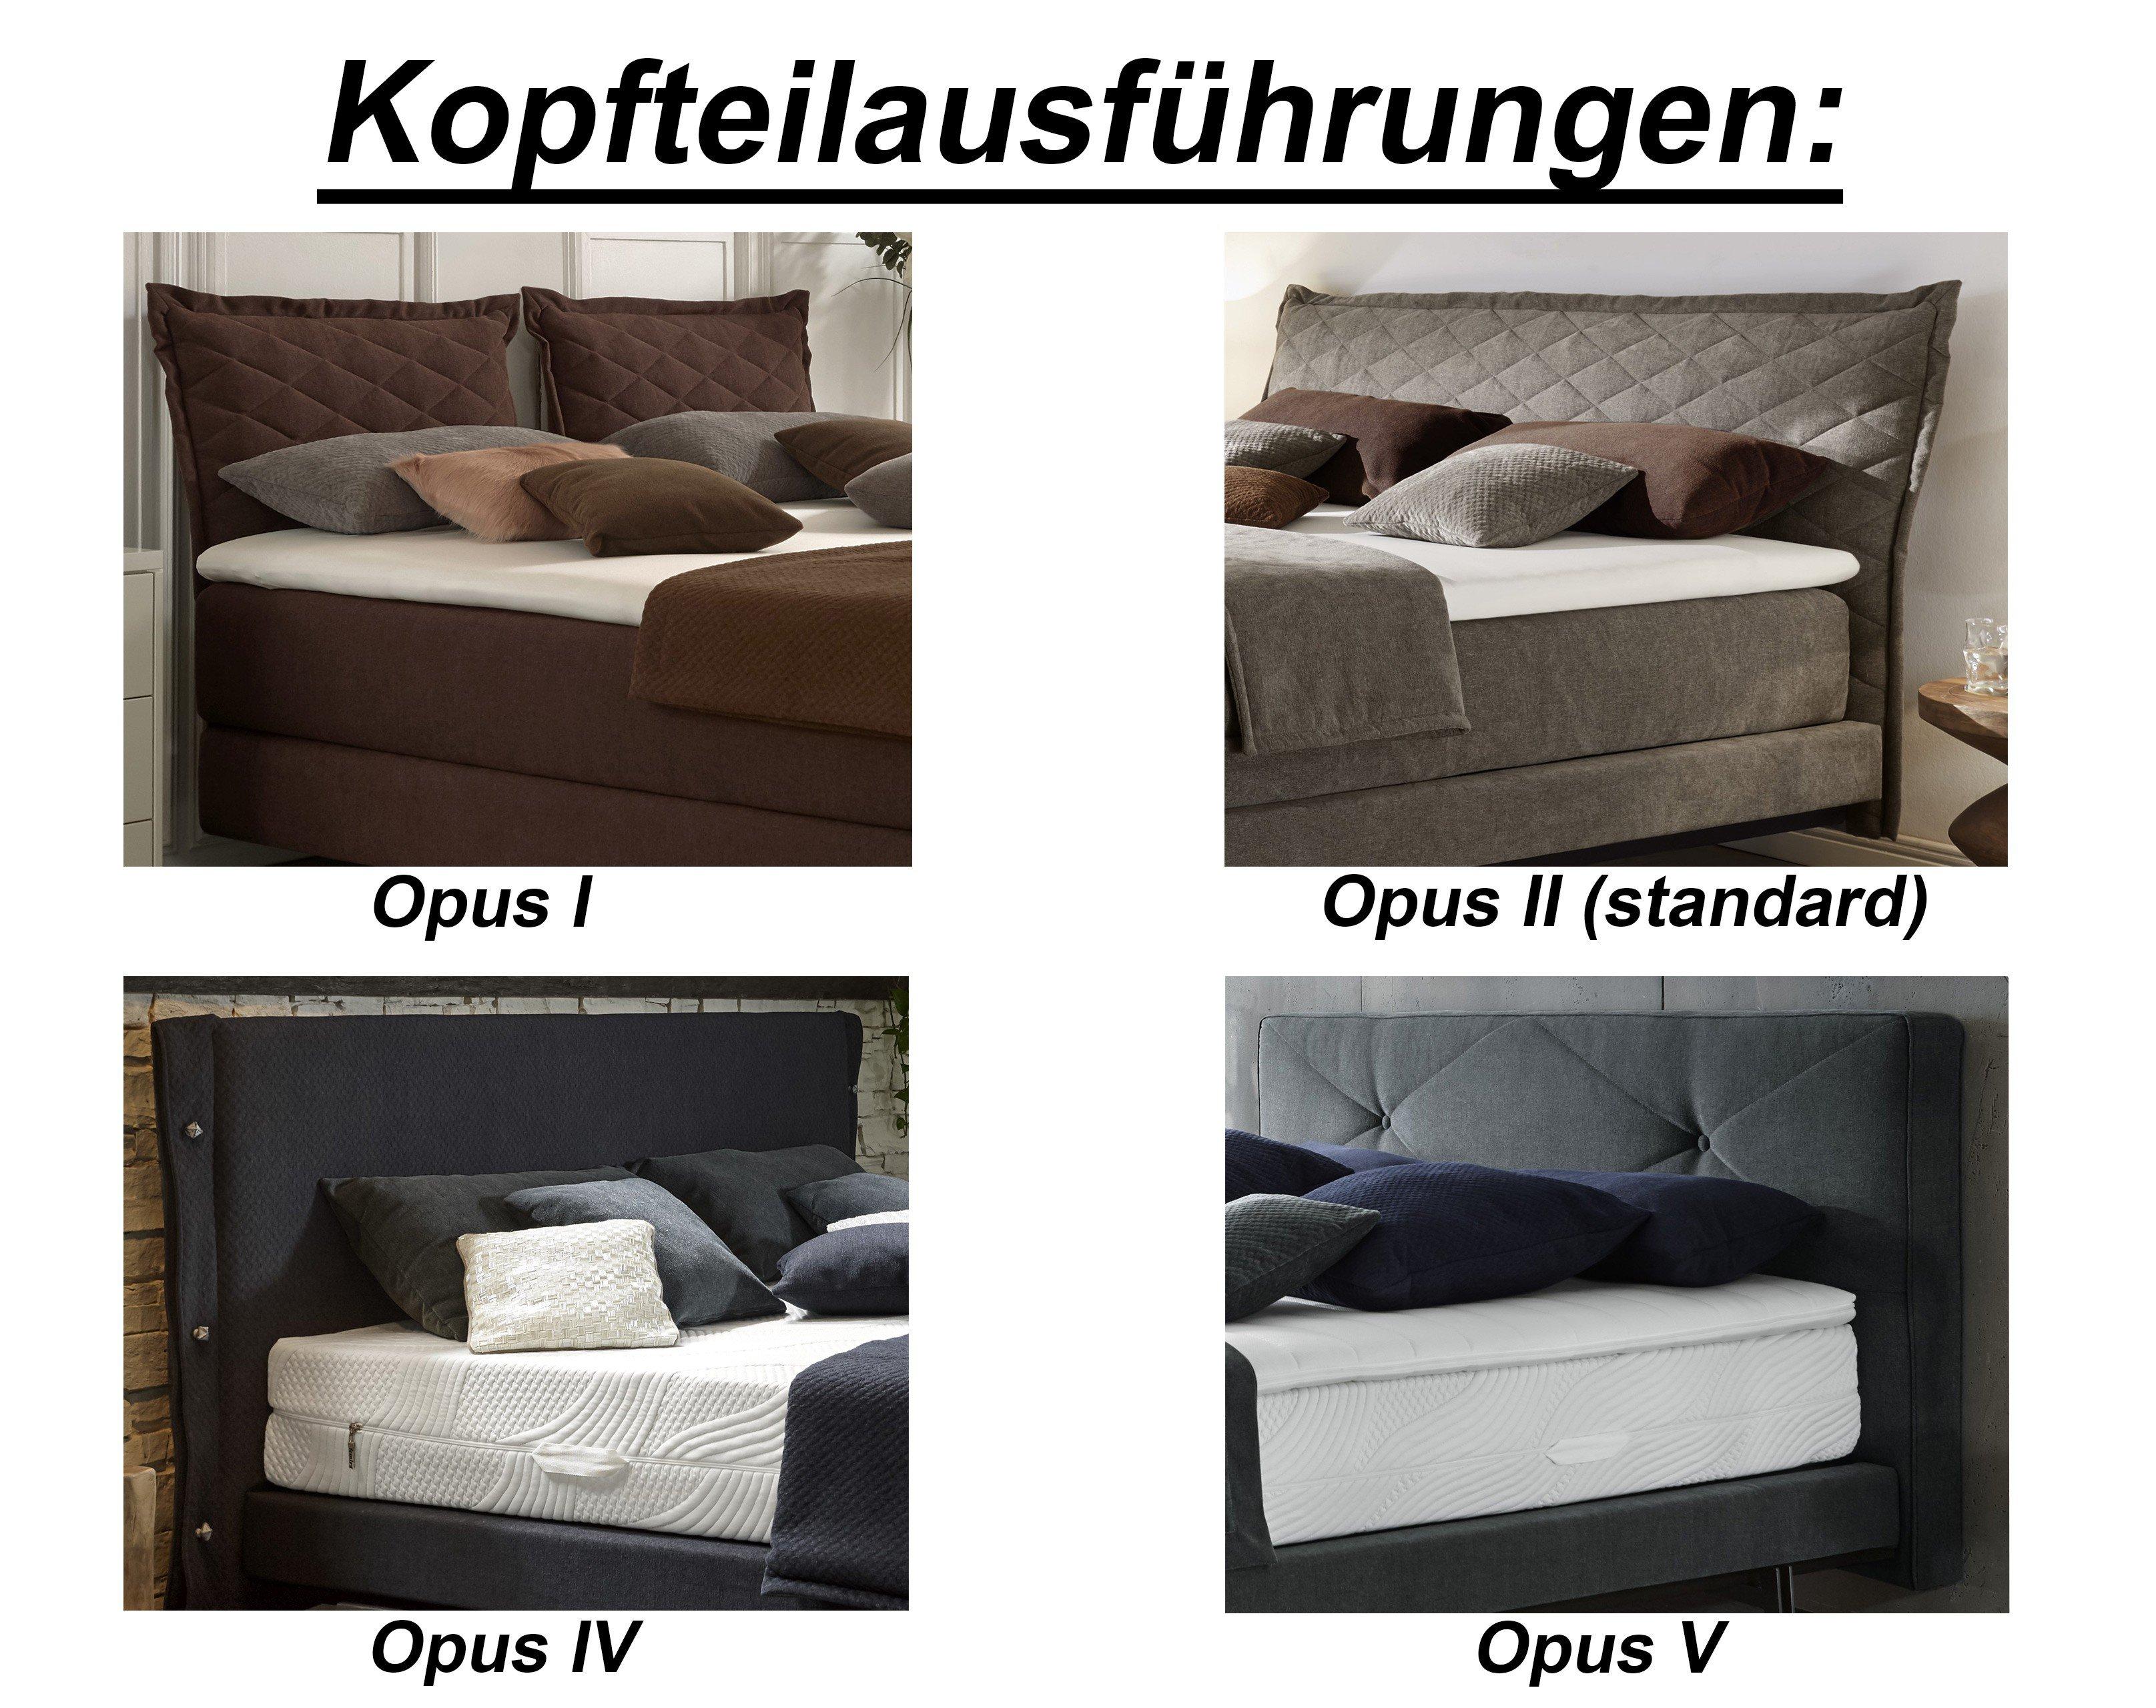 Femira Boxspringbett Creation Opus I in Braun   Möbel Letz - Ihr ...